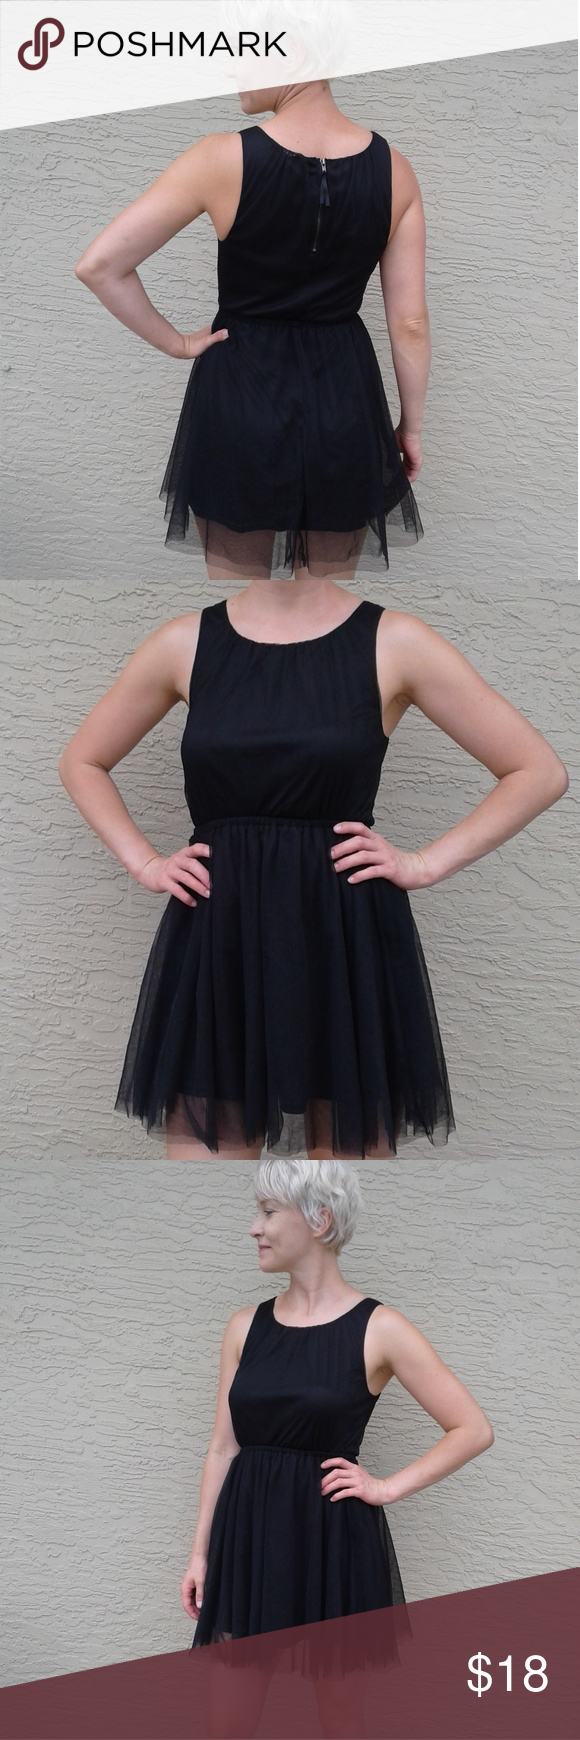 H M Party Dress Fun Flirty Short Black Dress With Net Overlay Zipper Back Divided By H M Dresses Mini Dresses Black Short Dress Party Dress [ 1740 x 580 Pixel ]